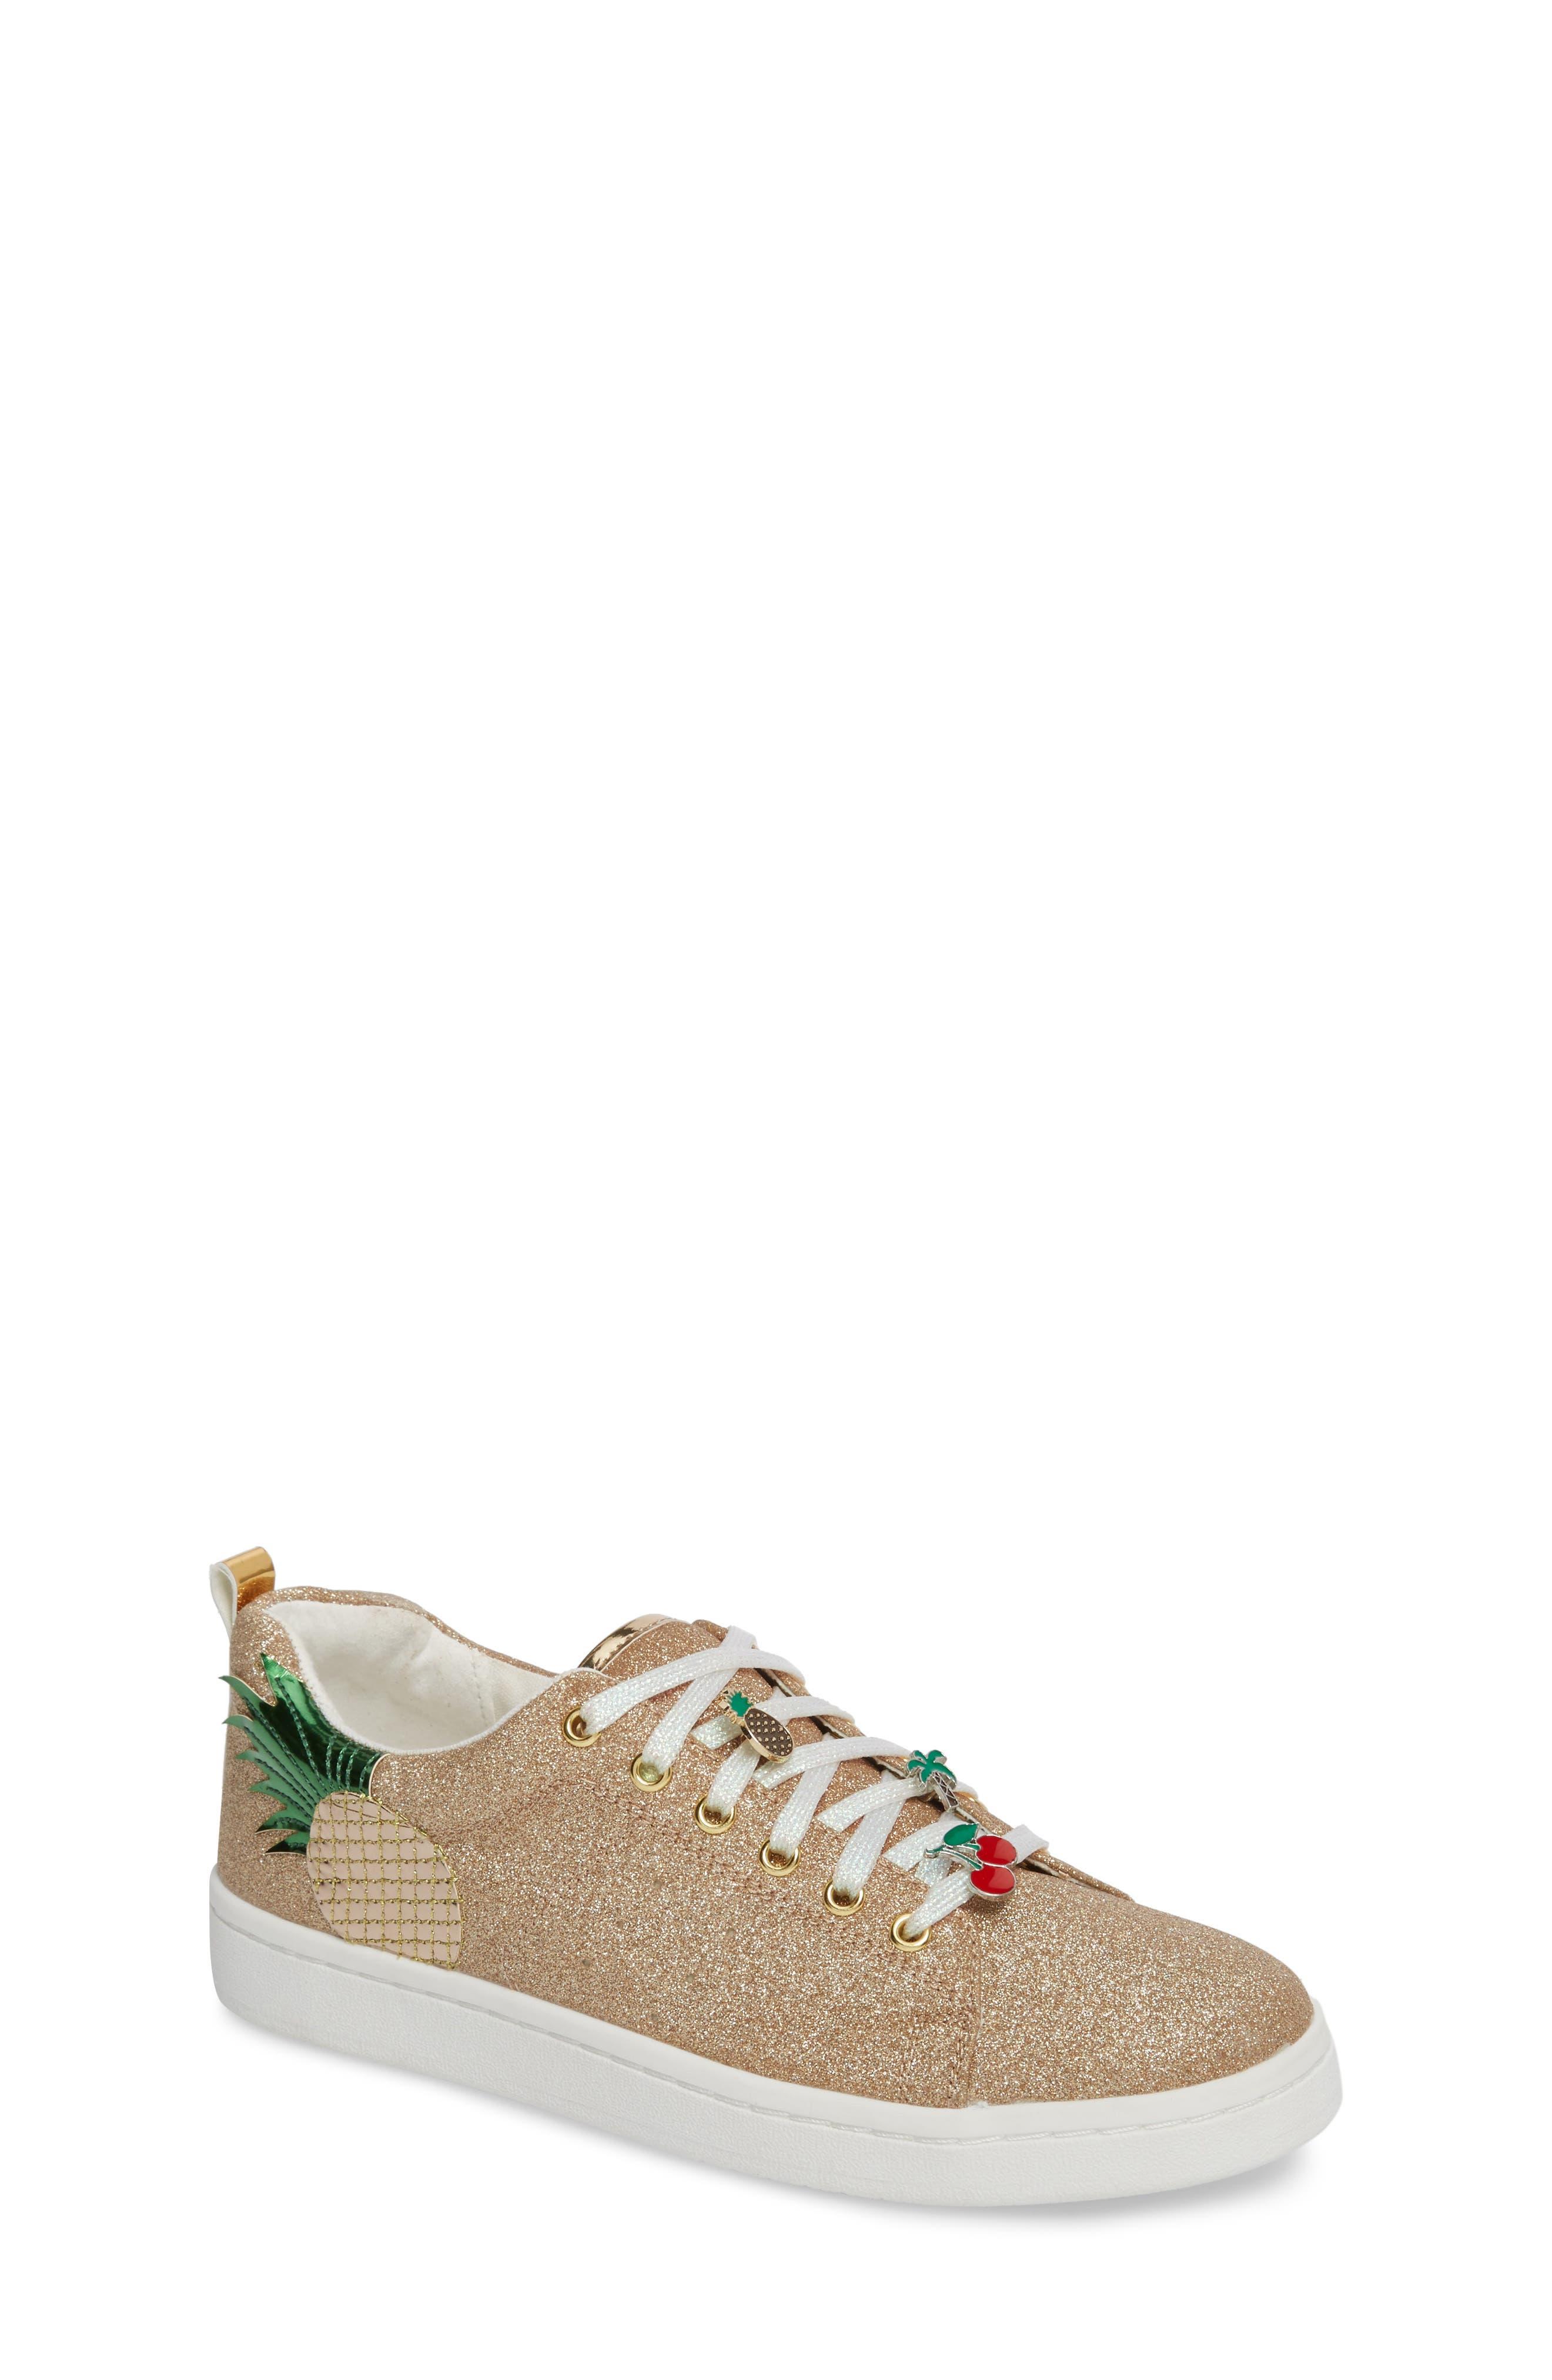 Blane Myth Glitter Sneaker,                             Main thumbnail 1, color,                             Golden Pineapple Faux Leather